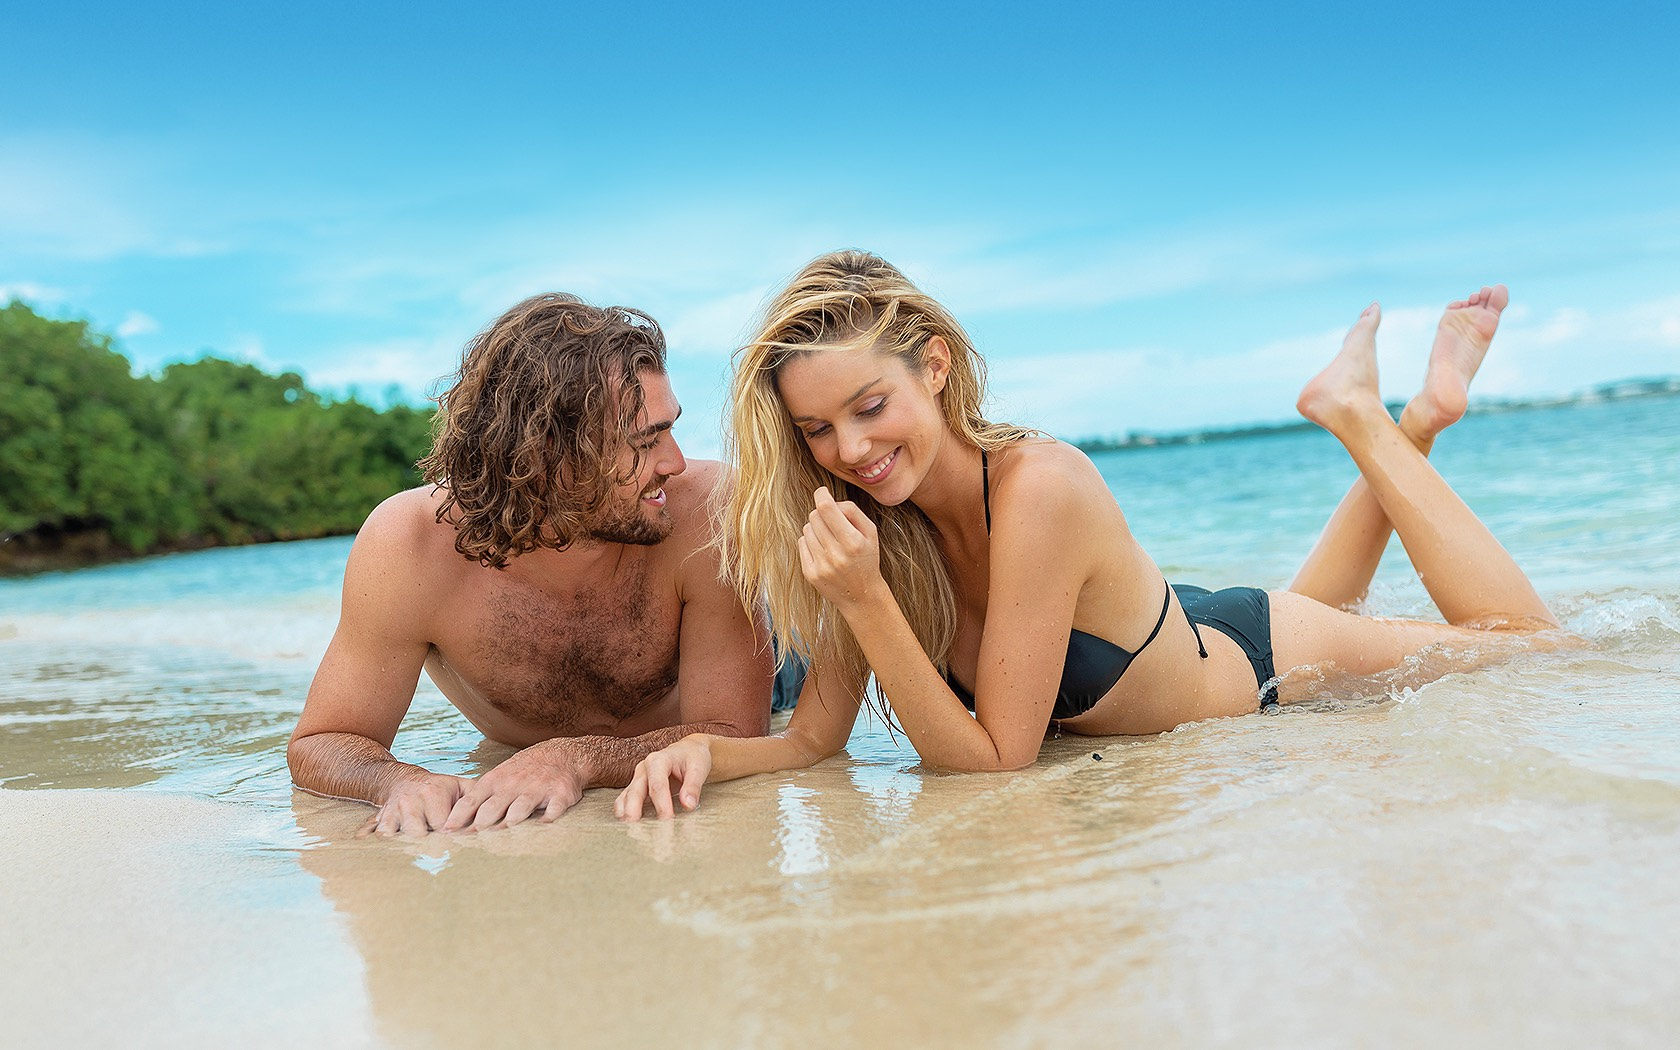 10 Reasons to visit Couples Resorts - Couples Resorts